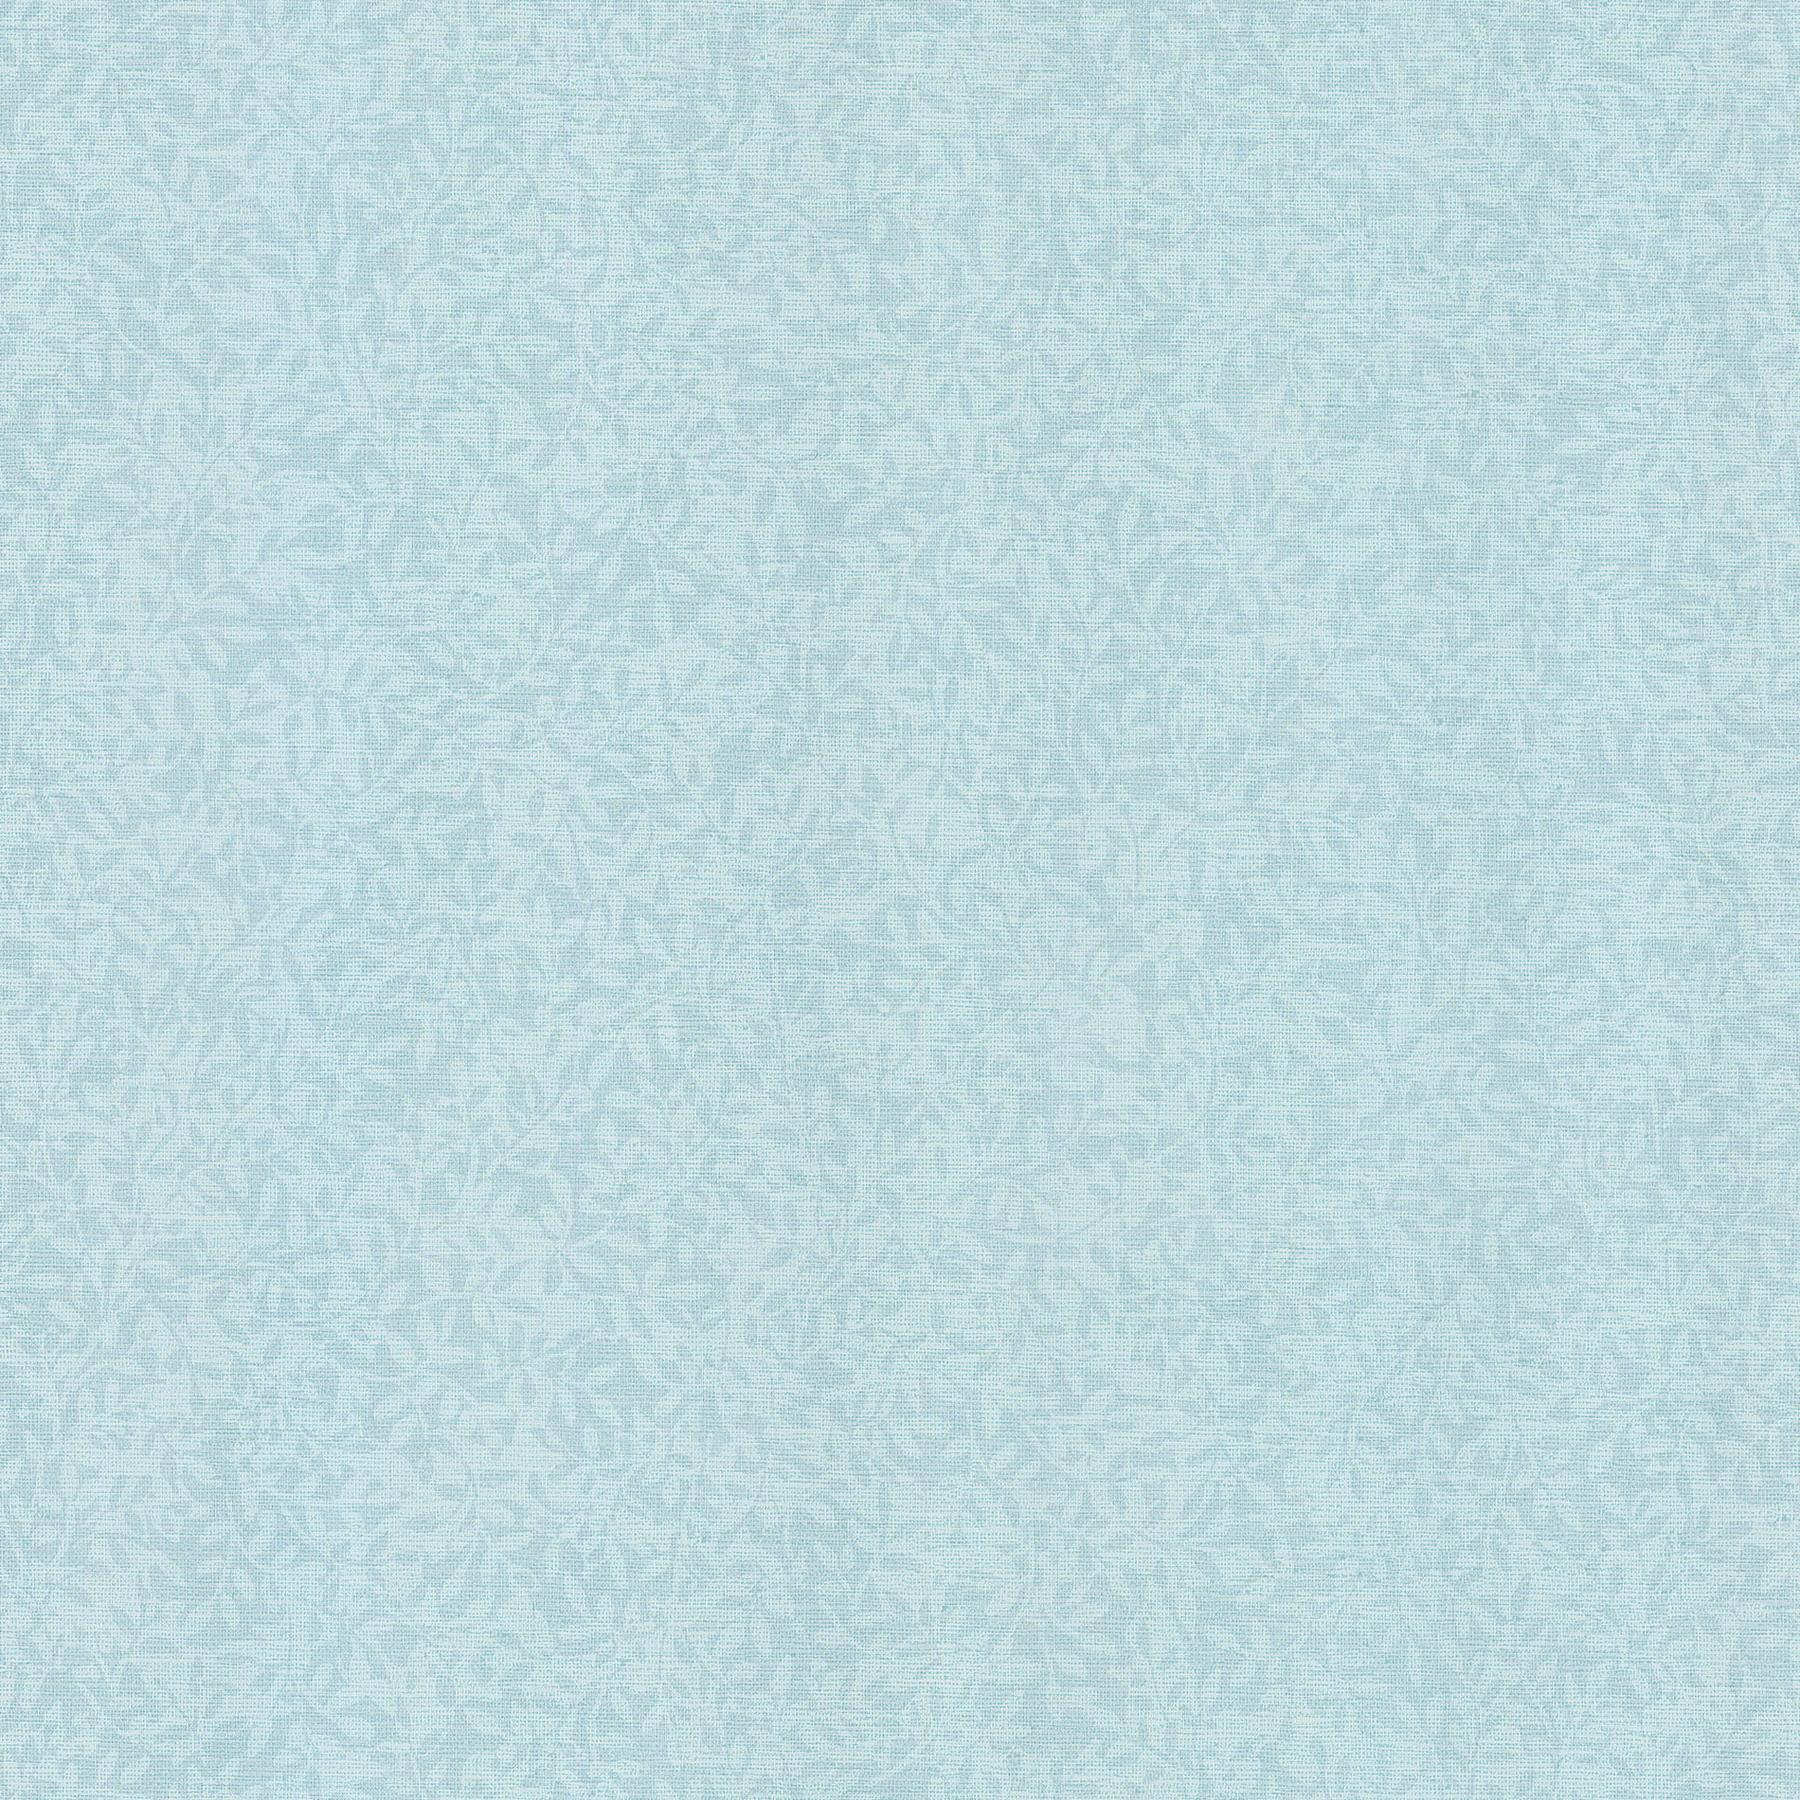 Picture of Ariston Turquoise Vine Silhouette Wallpaper